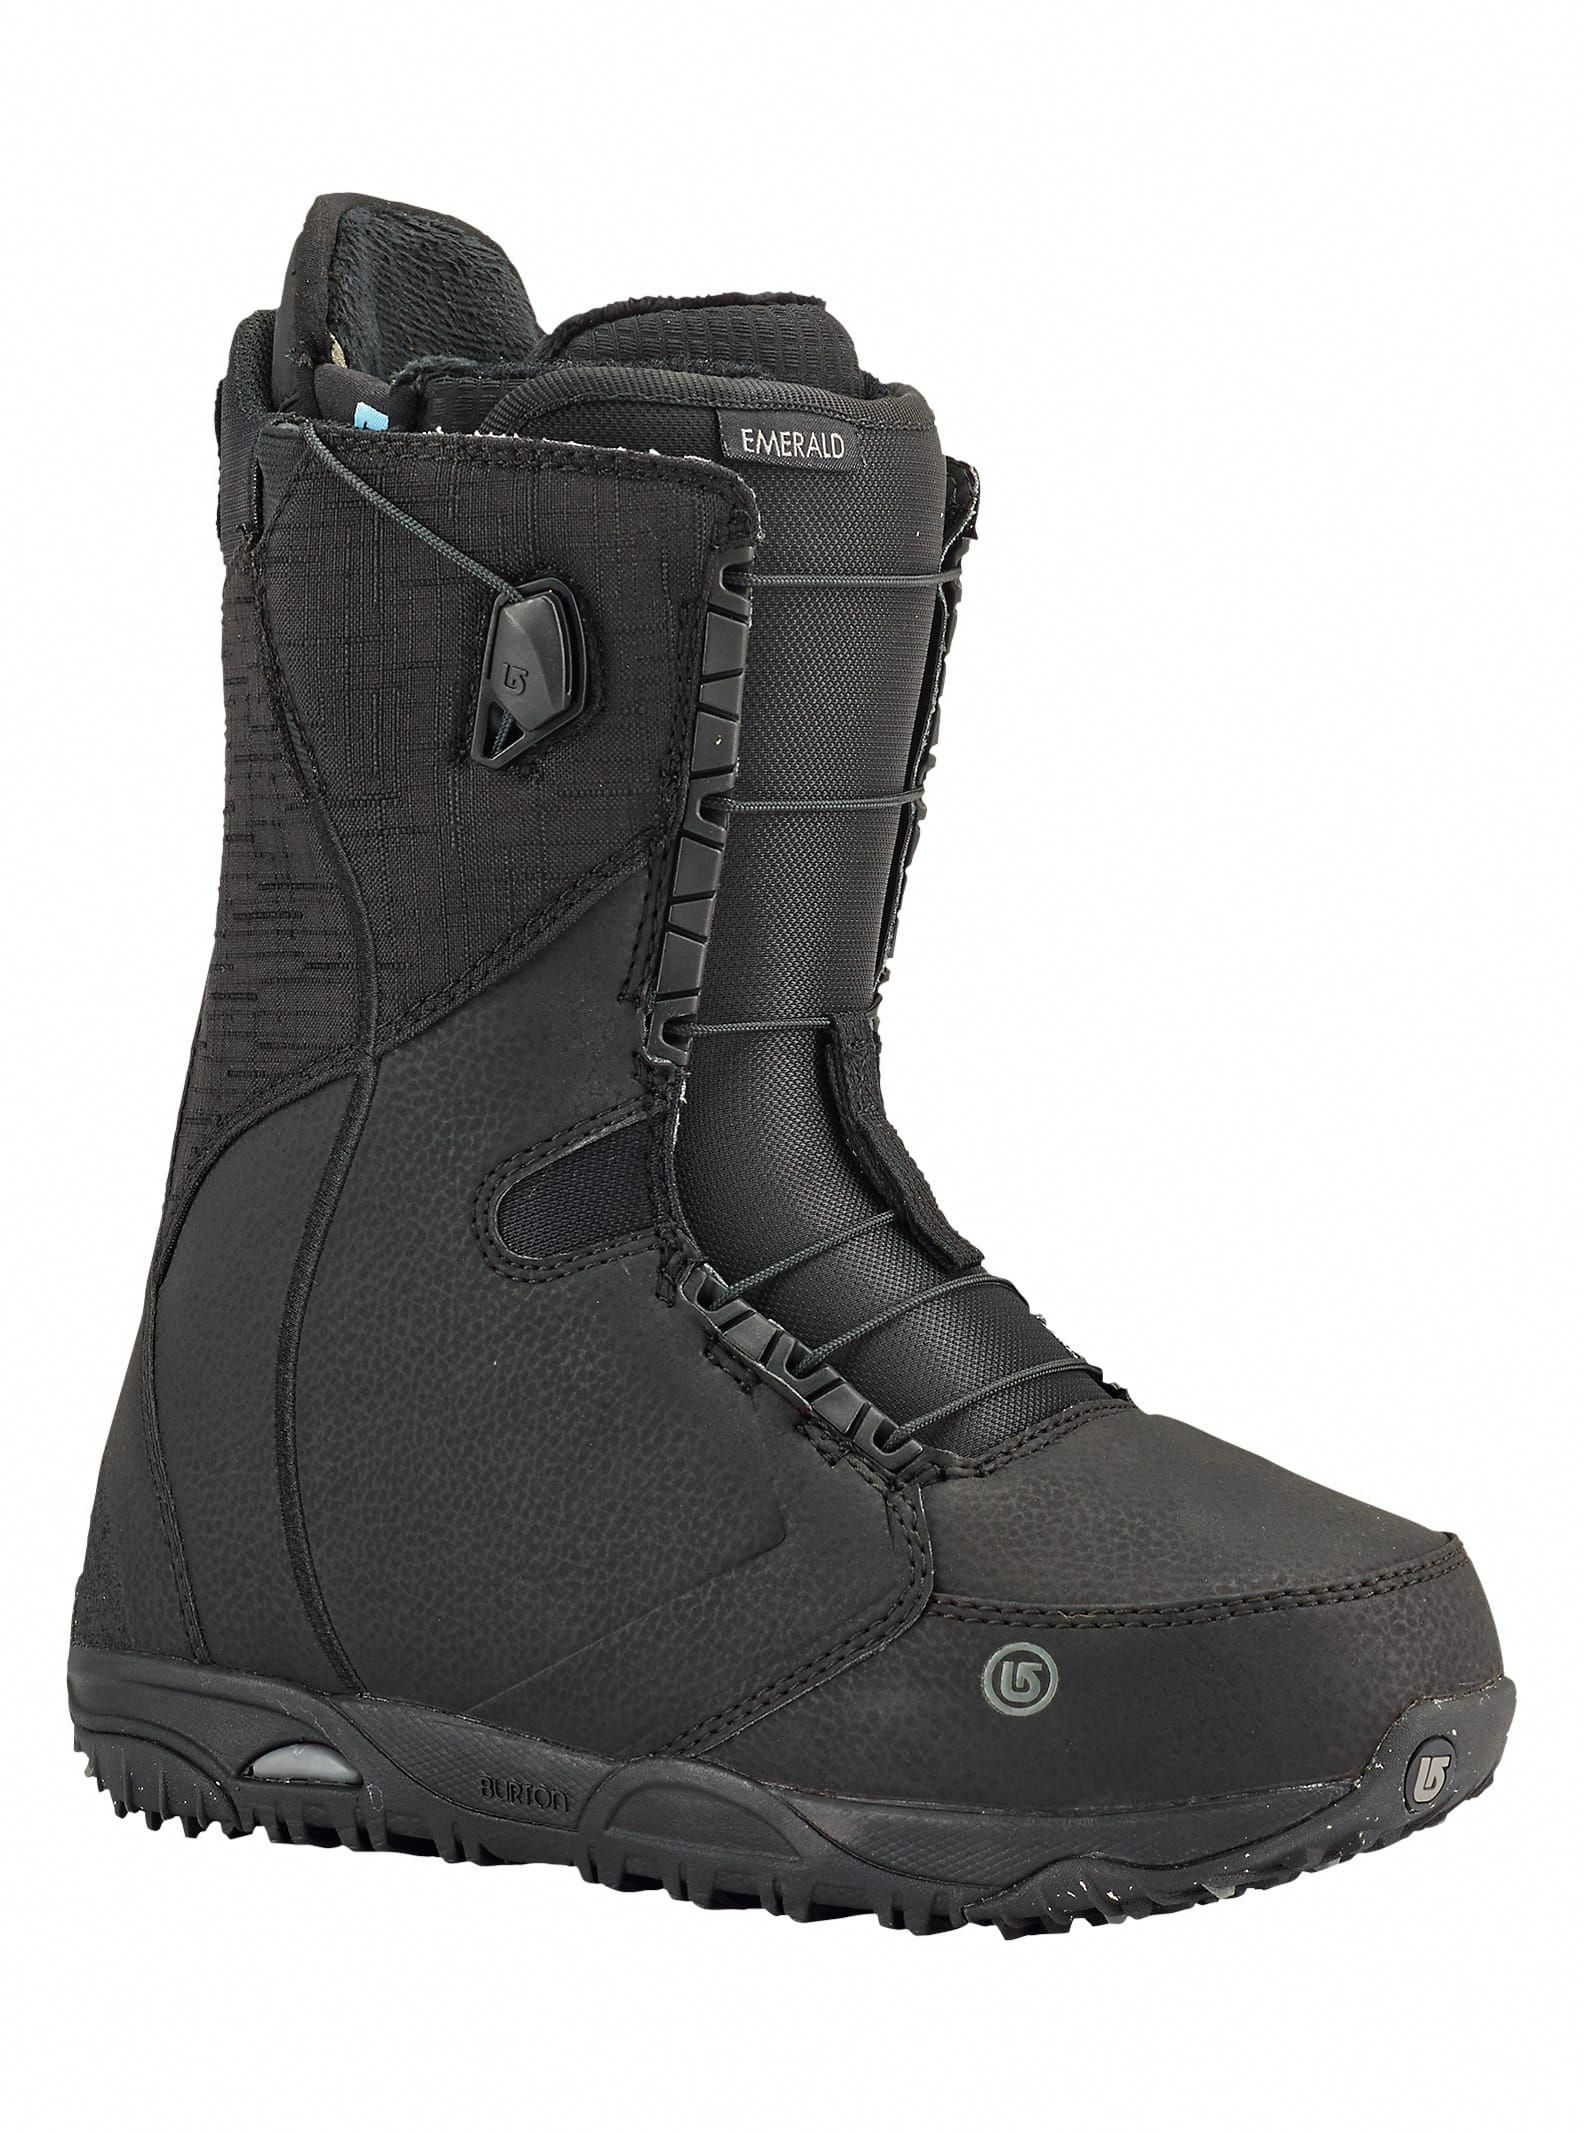 Burton Emerald Snowboard Boot Snowboard Boots Boots Winter Boots